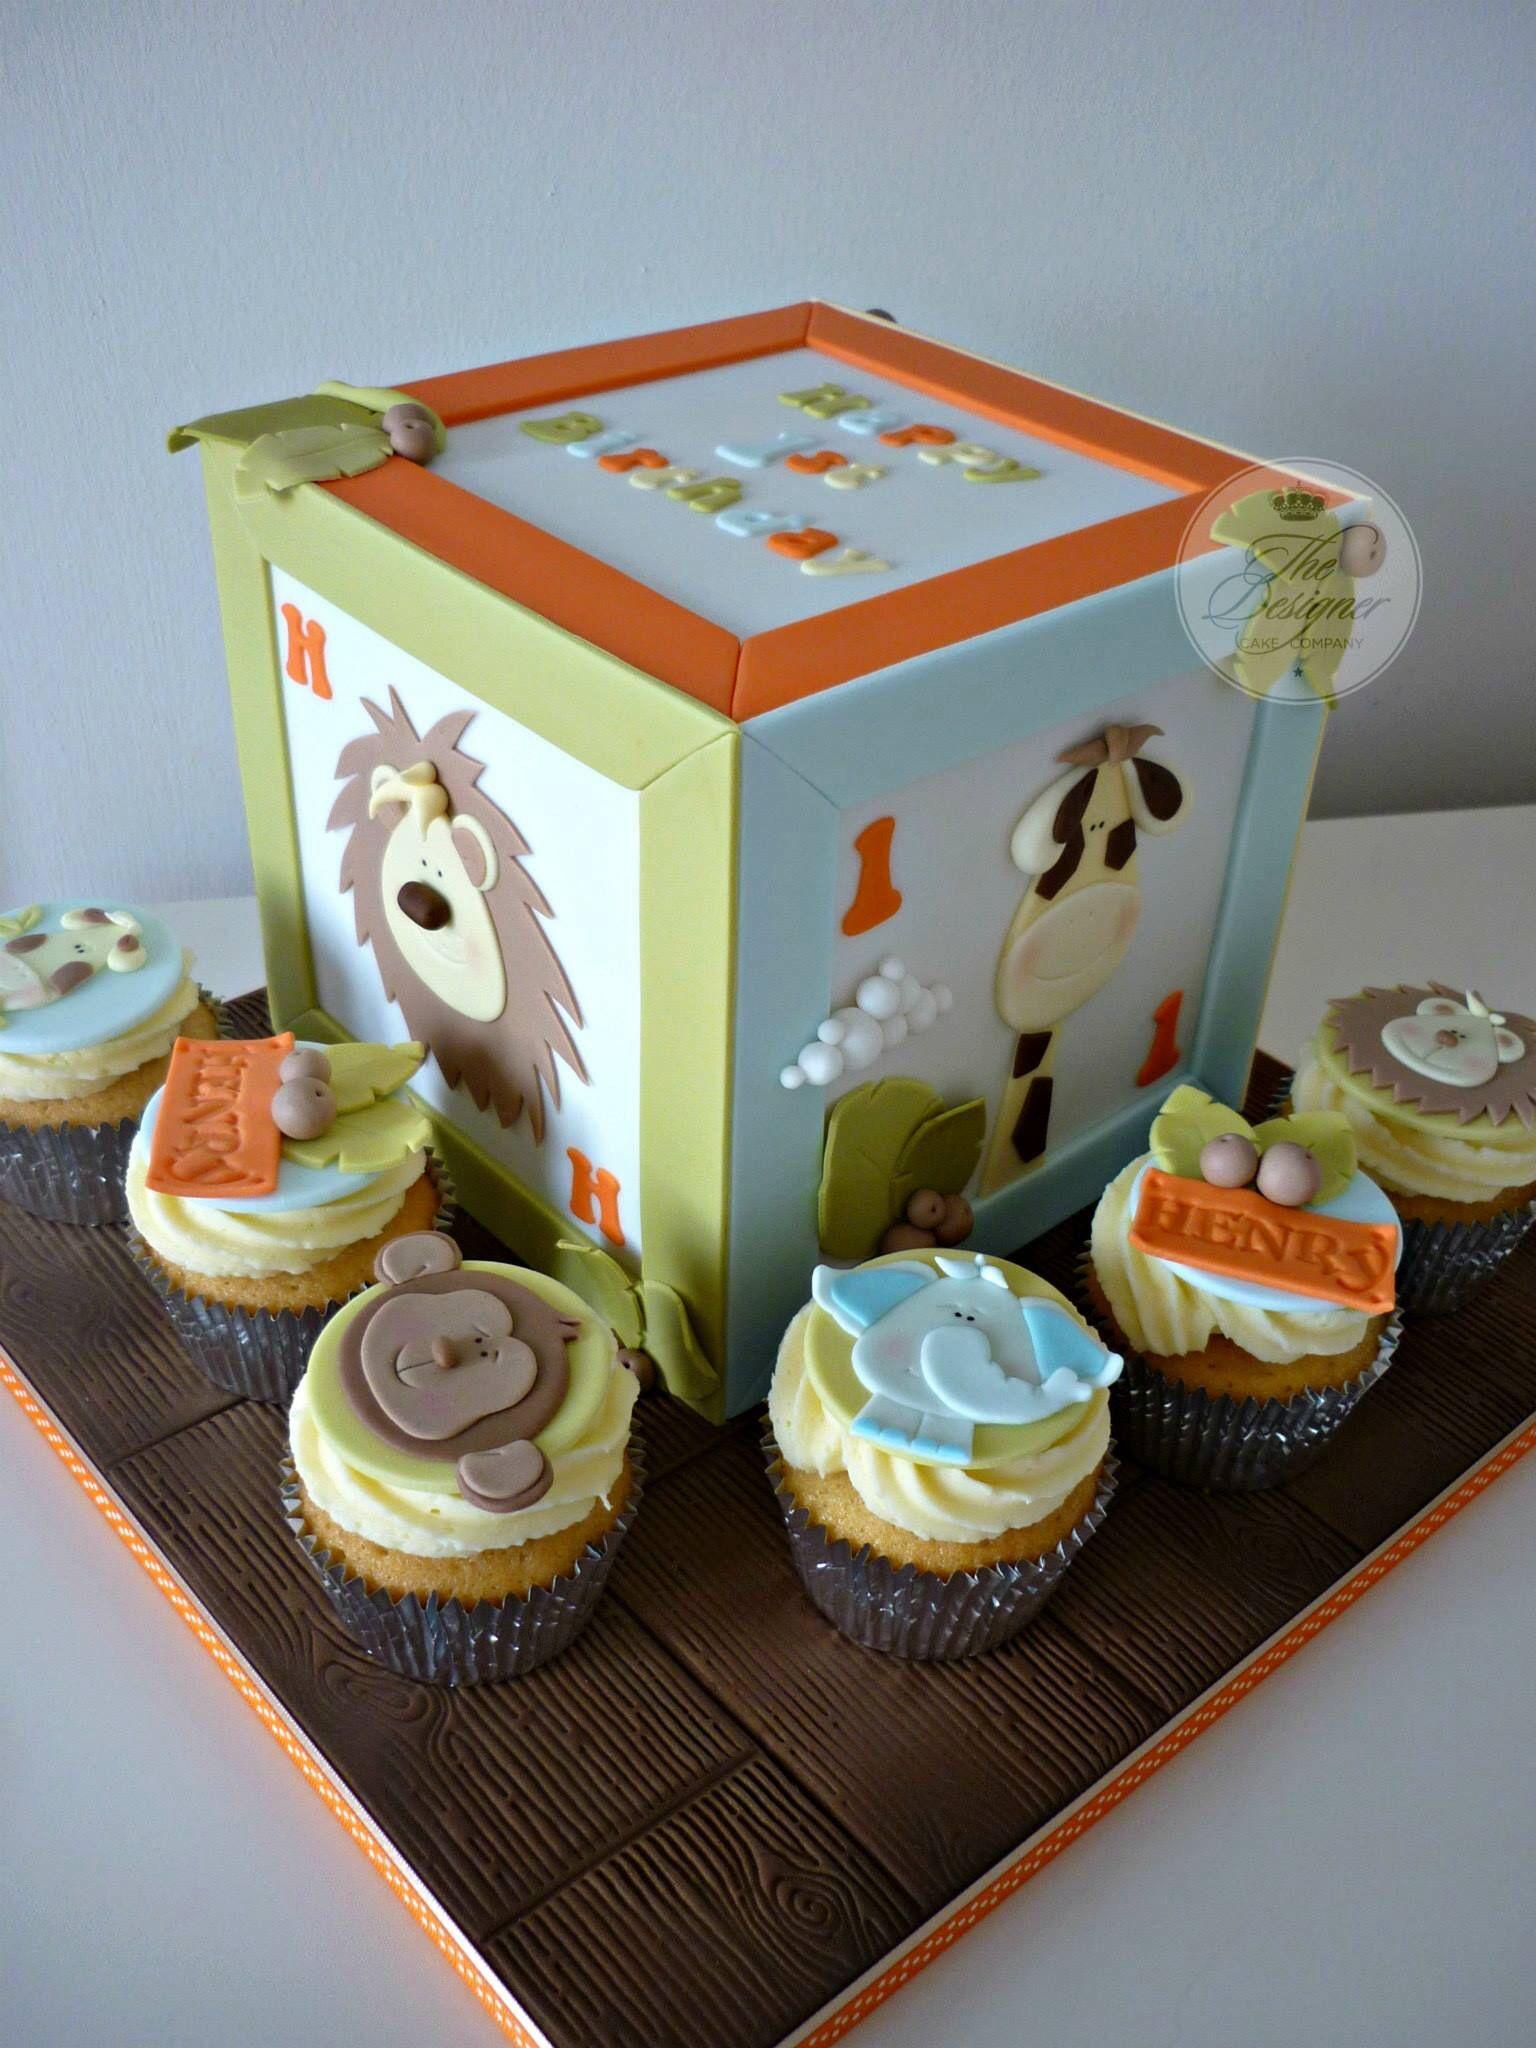 cakes funnel cakes zucchini cakes russian tea cakes i colcannon cakes ...